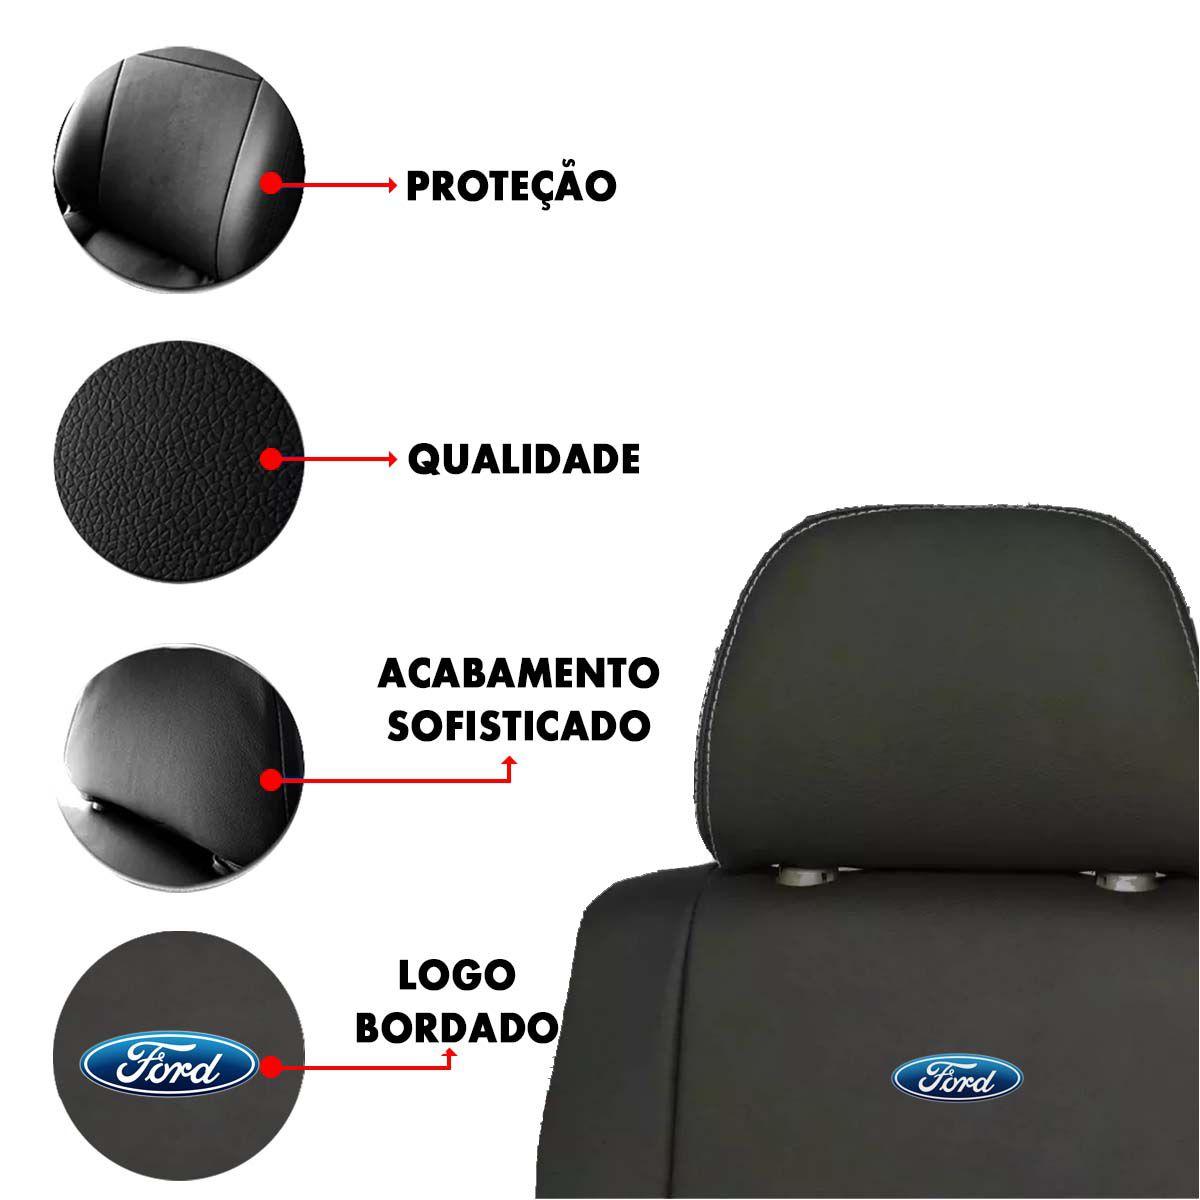 Capa de Banco Ford Ka Fiesta Ecosport Escort F250 F100 Couro Sintetico Bordado Poliparts